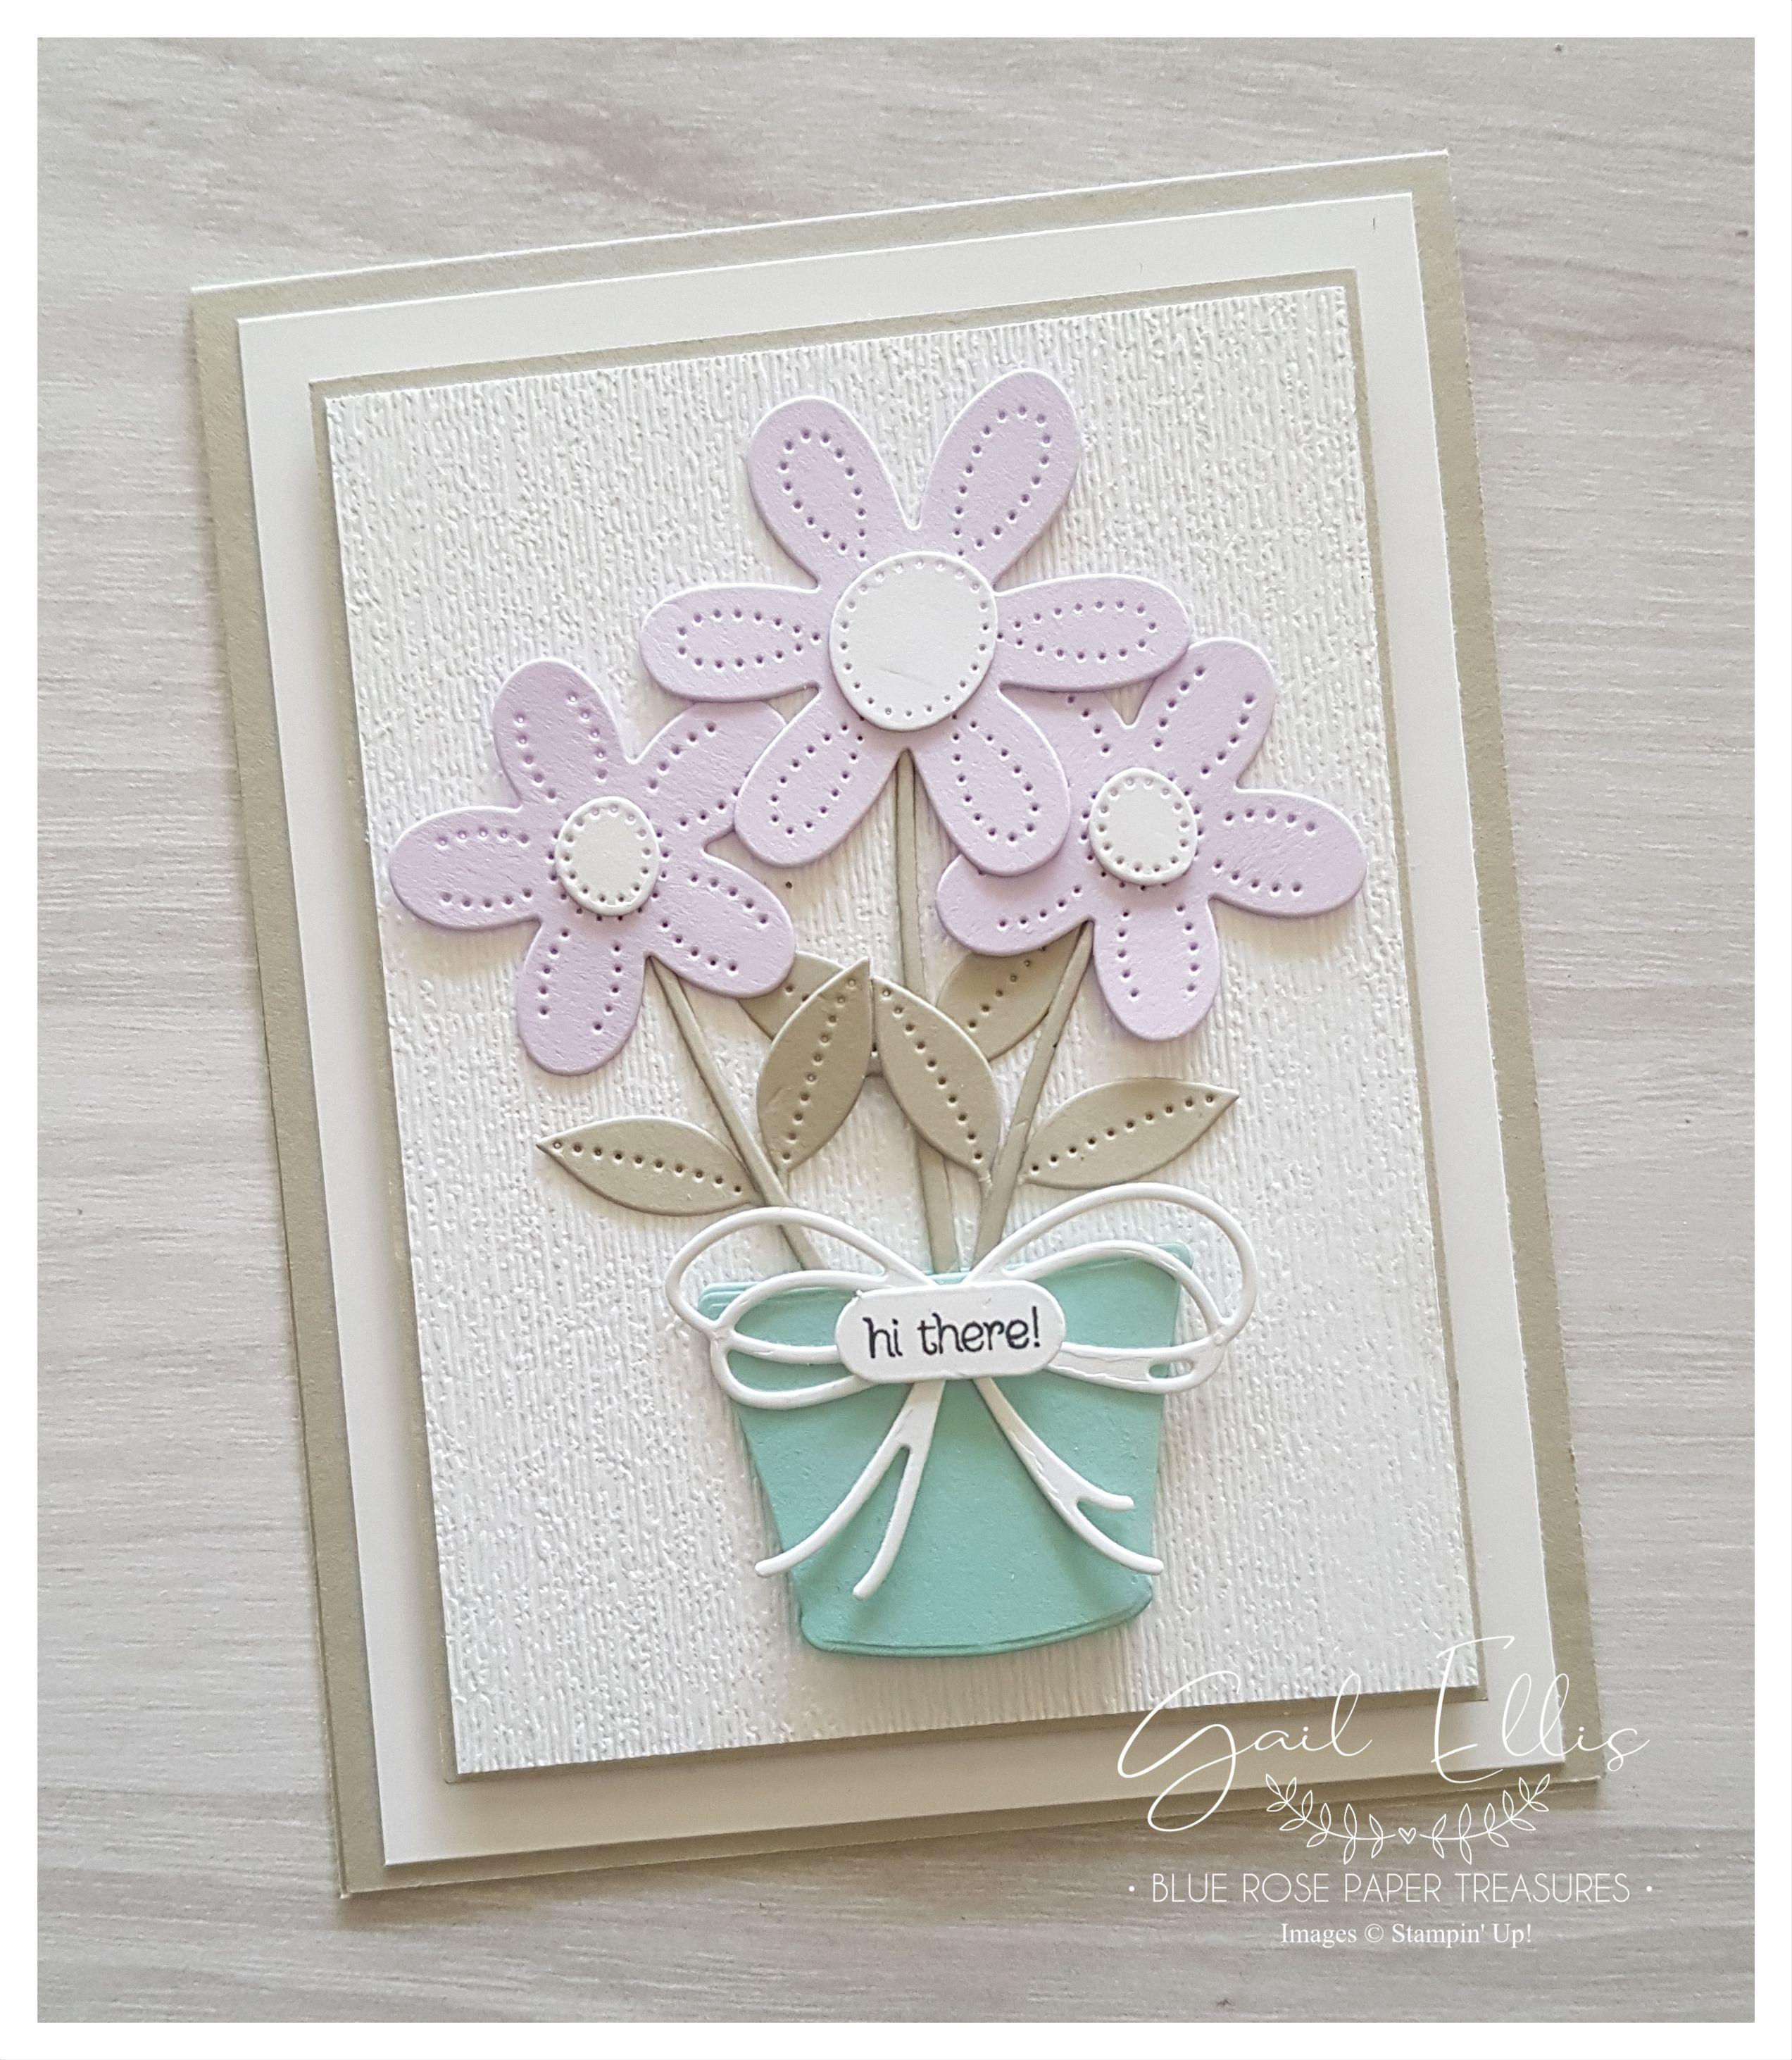 Stampin Up Pierced Blooms Dies Cards